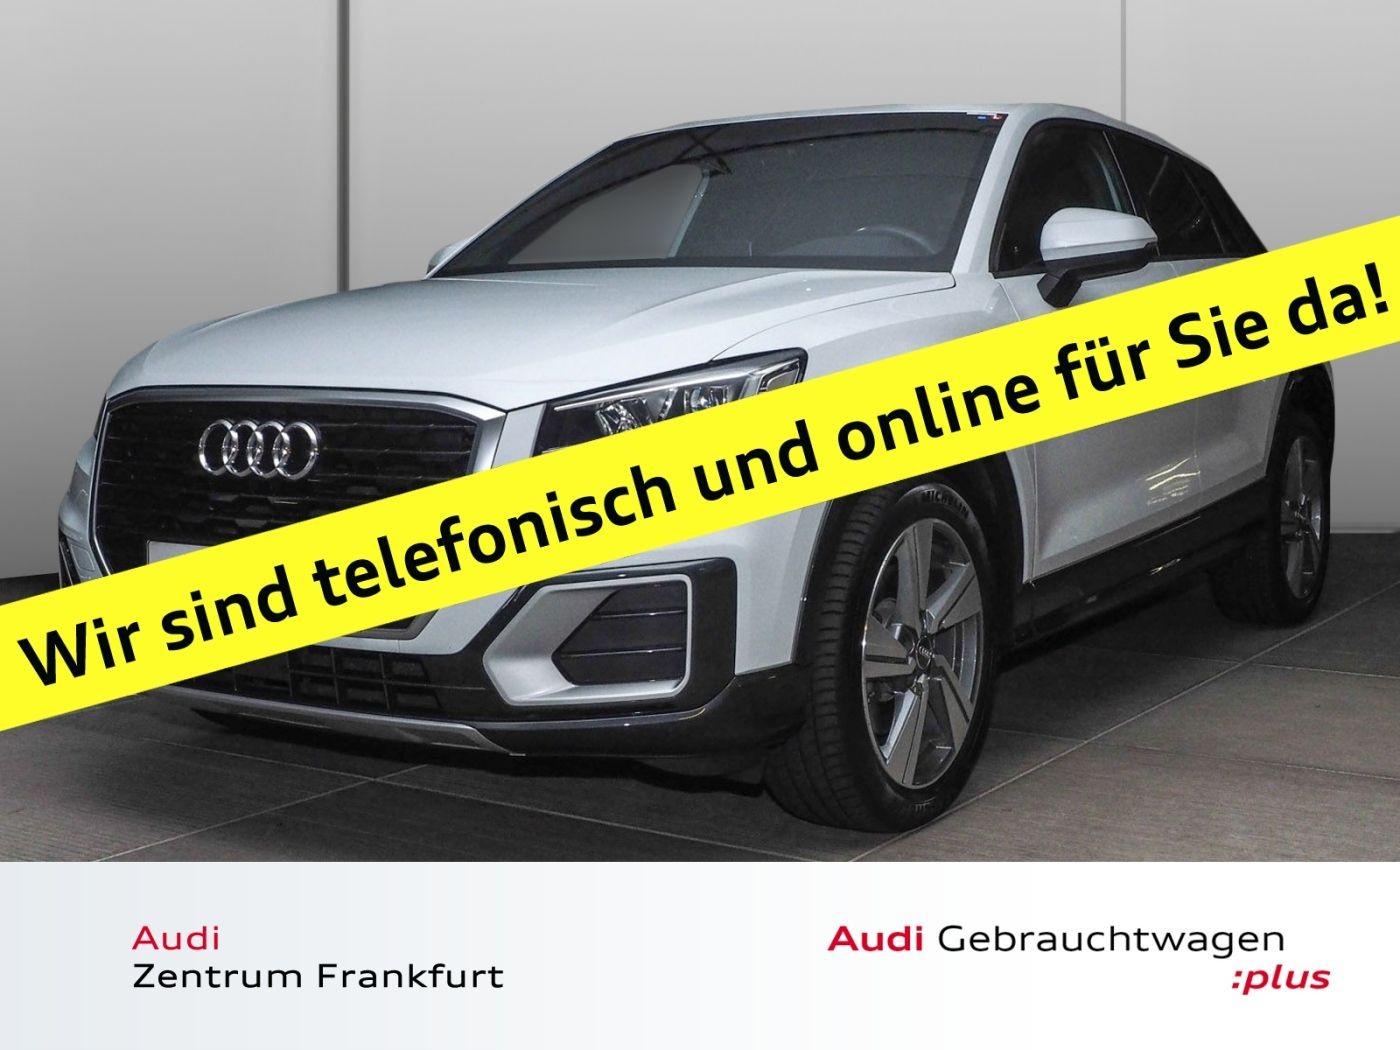 Audi Q2 1.0 TFSI ultra S tronic S line LED Navi Tempomat, Jahr 2017, Benzin